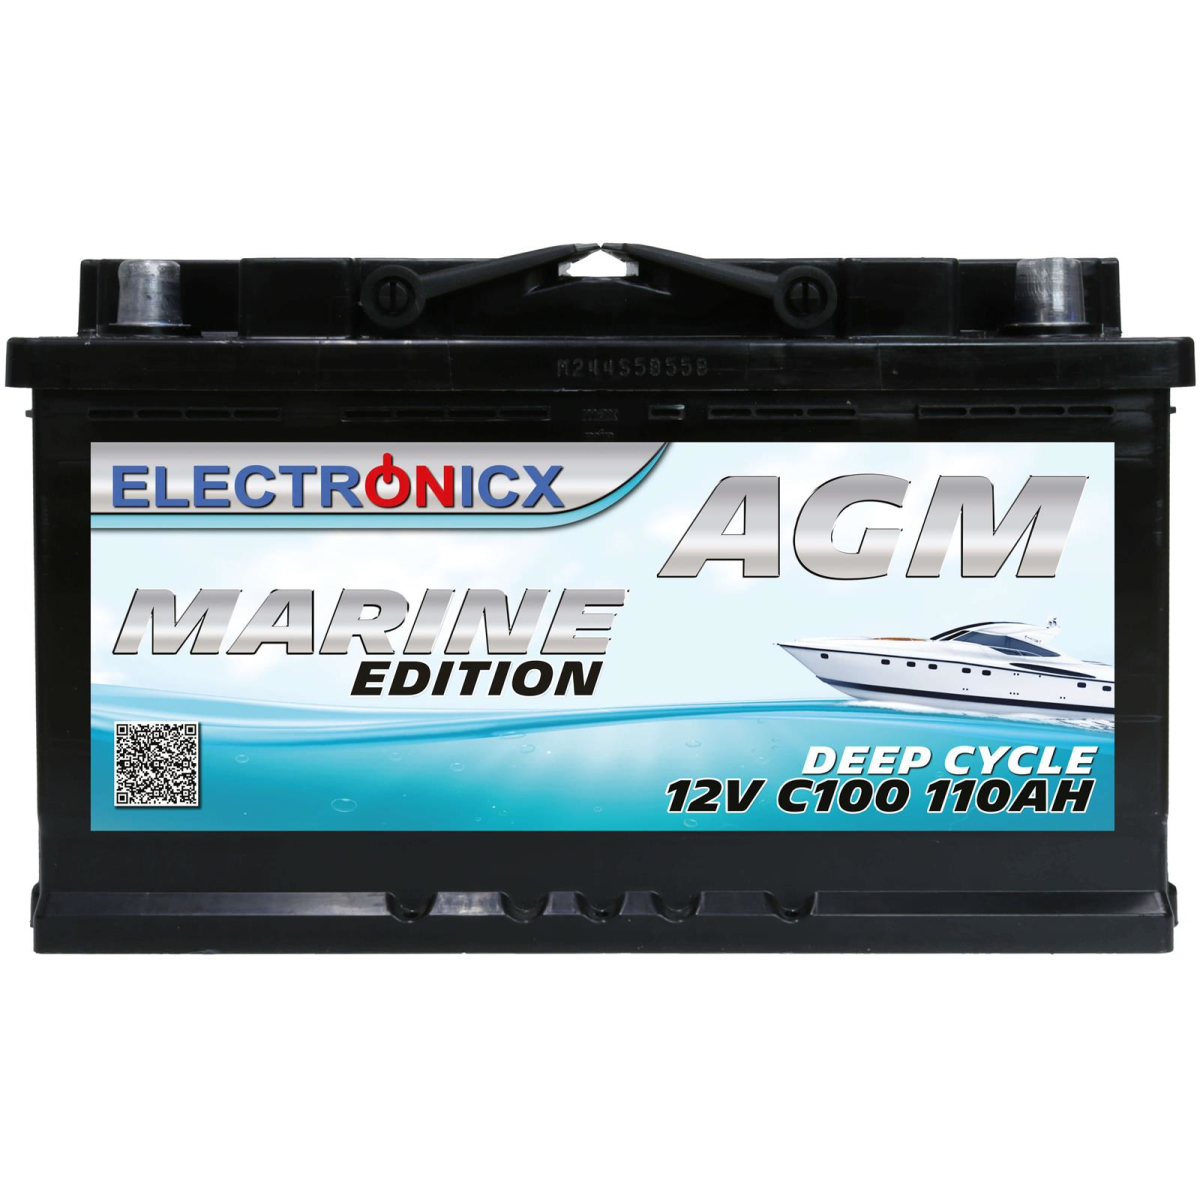 AGM Batterie 110AH Electronicx Marine Edition Boot Schiff Versorgungsbatterie 12V Akku Deep Bootsbatterie Autobatterie Solarbatterie Solar Batterien…